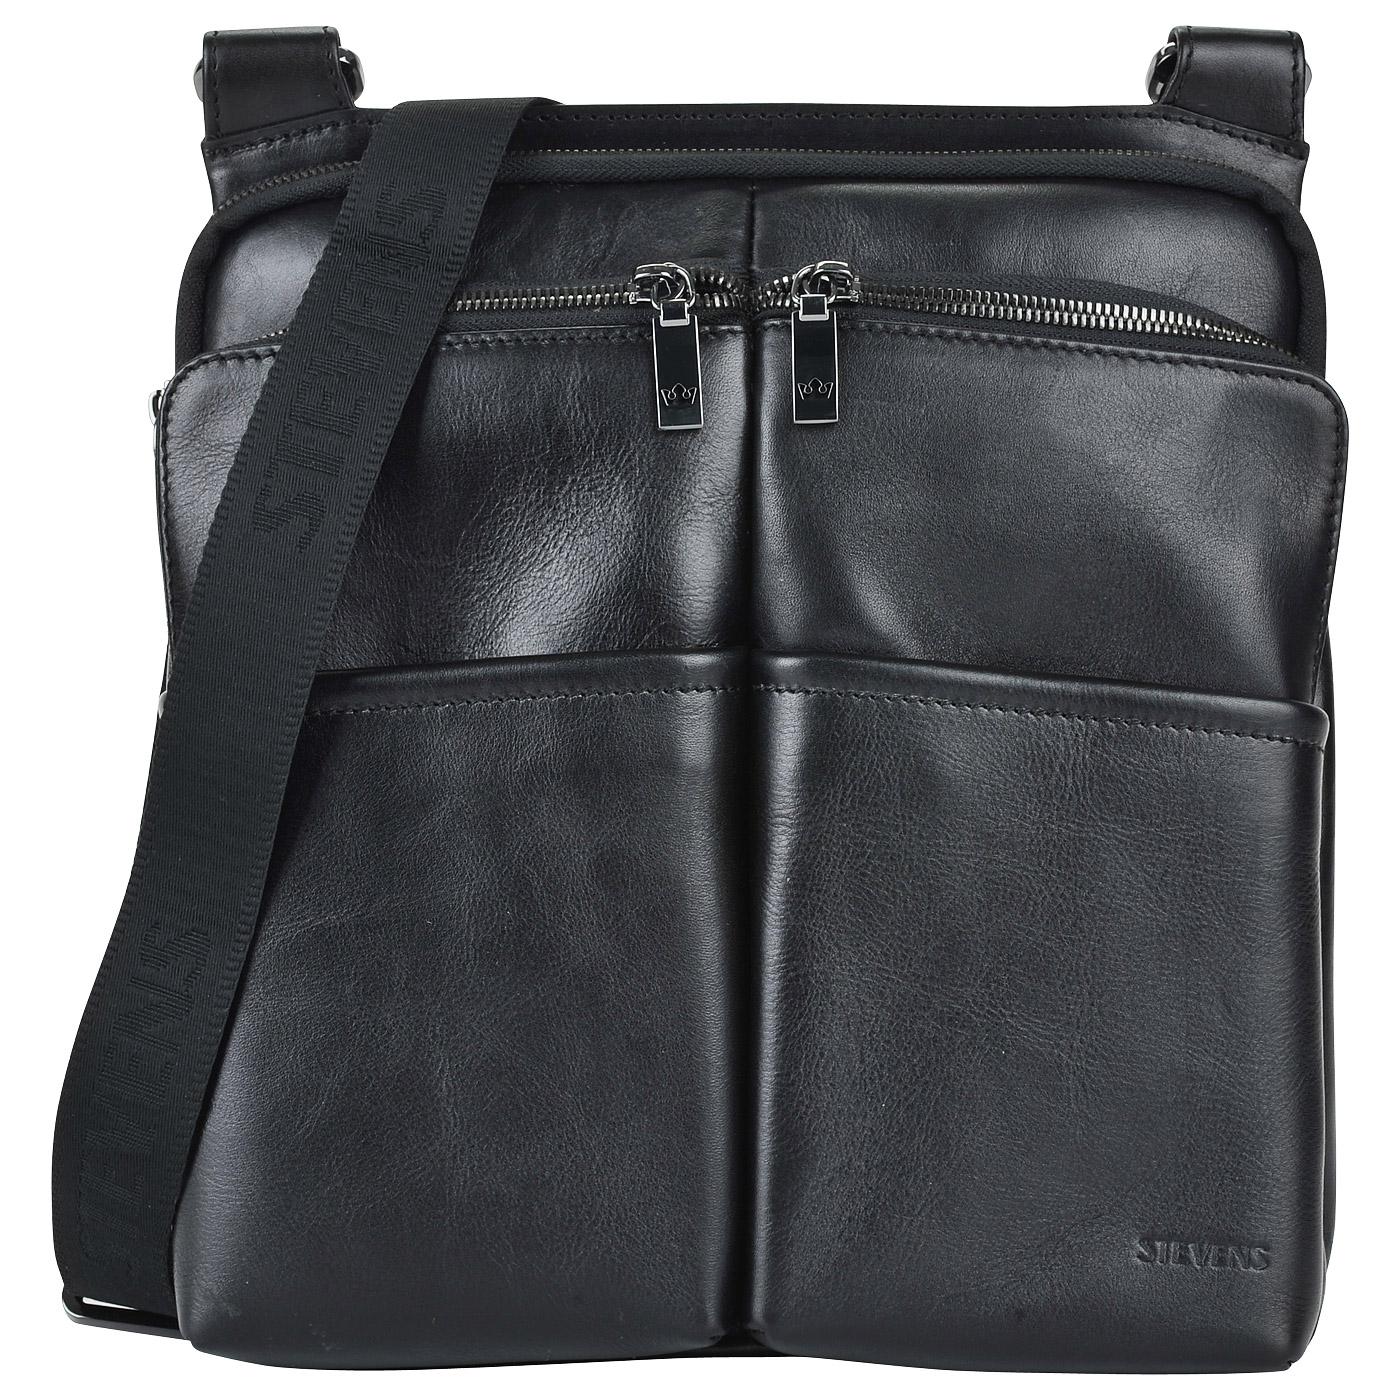 0b897c1b7d47 Мужская сумка через плечо из натуральной кожи Stevens STE-11026SF/CF ...